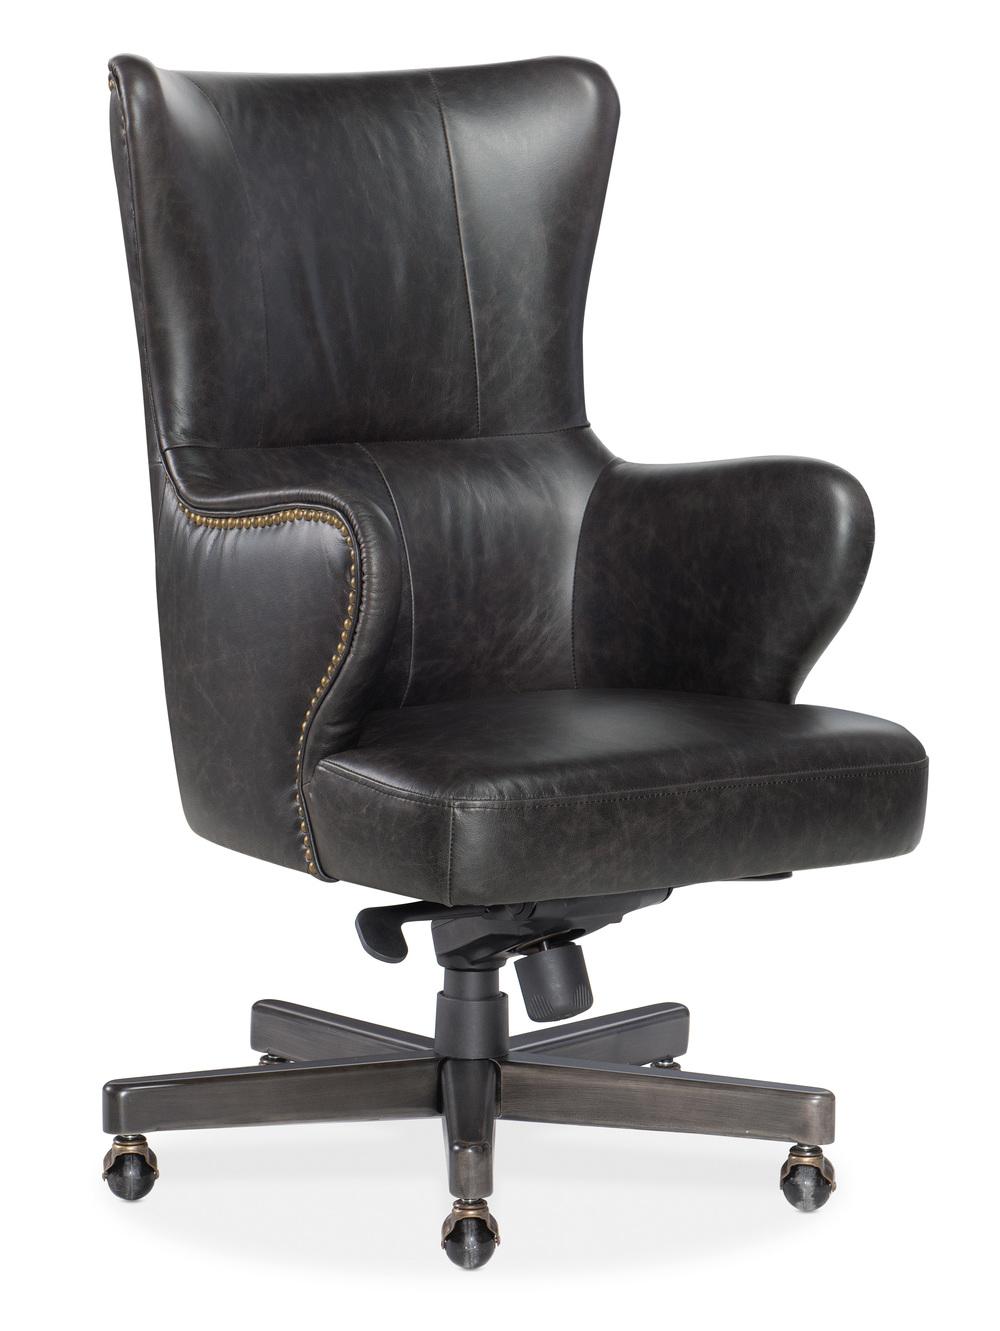 Hooker Furniture - Amelia Executive Swivel Tilt Chair